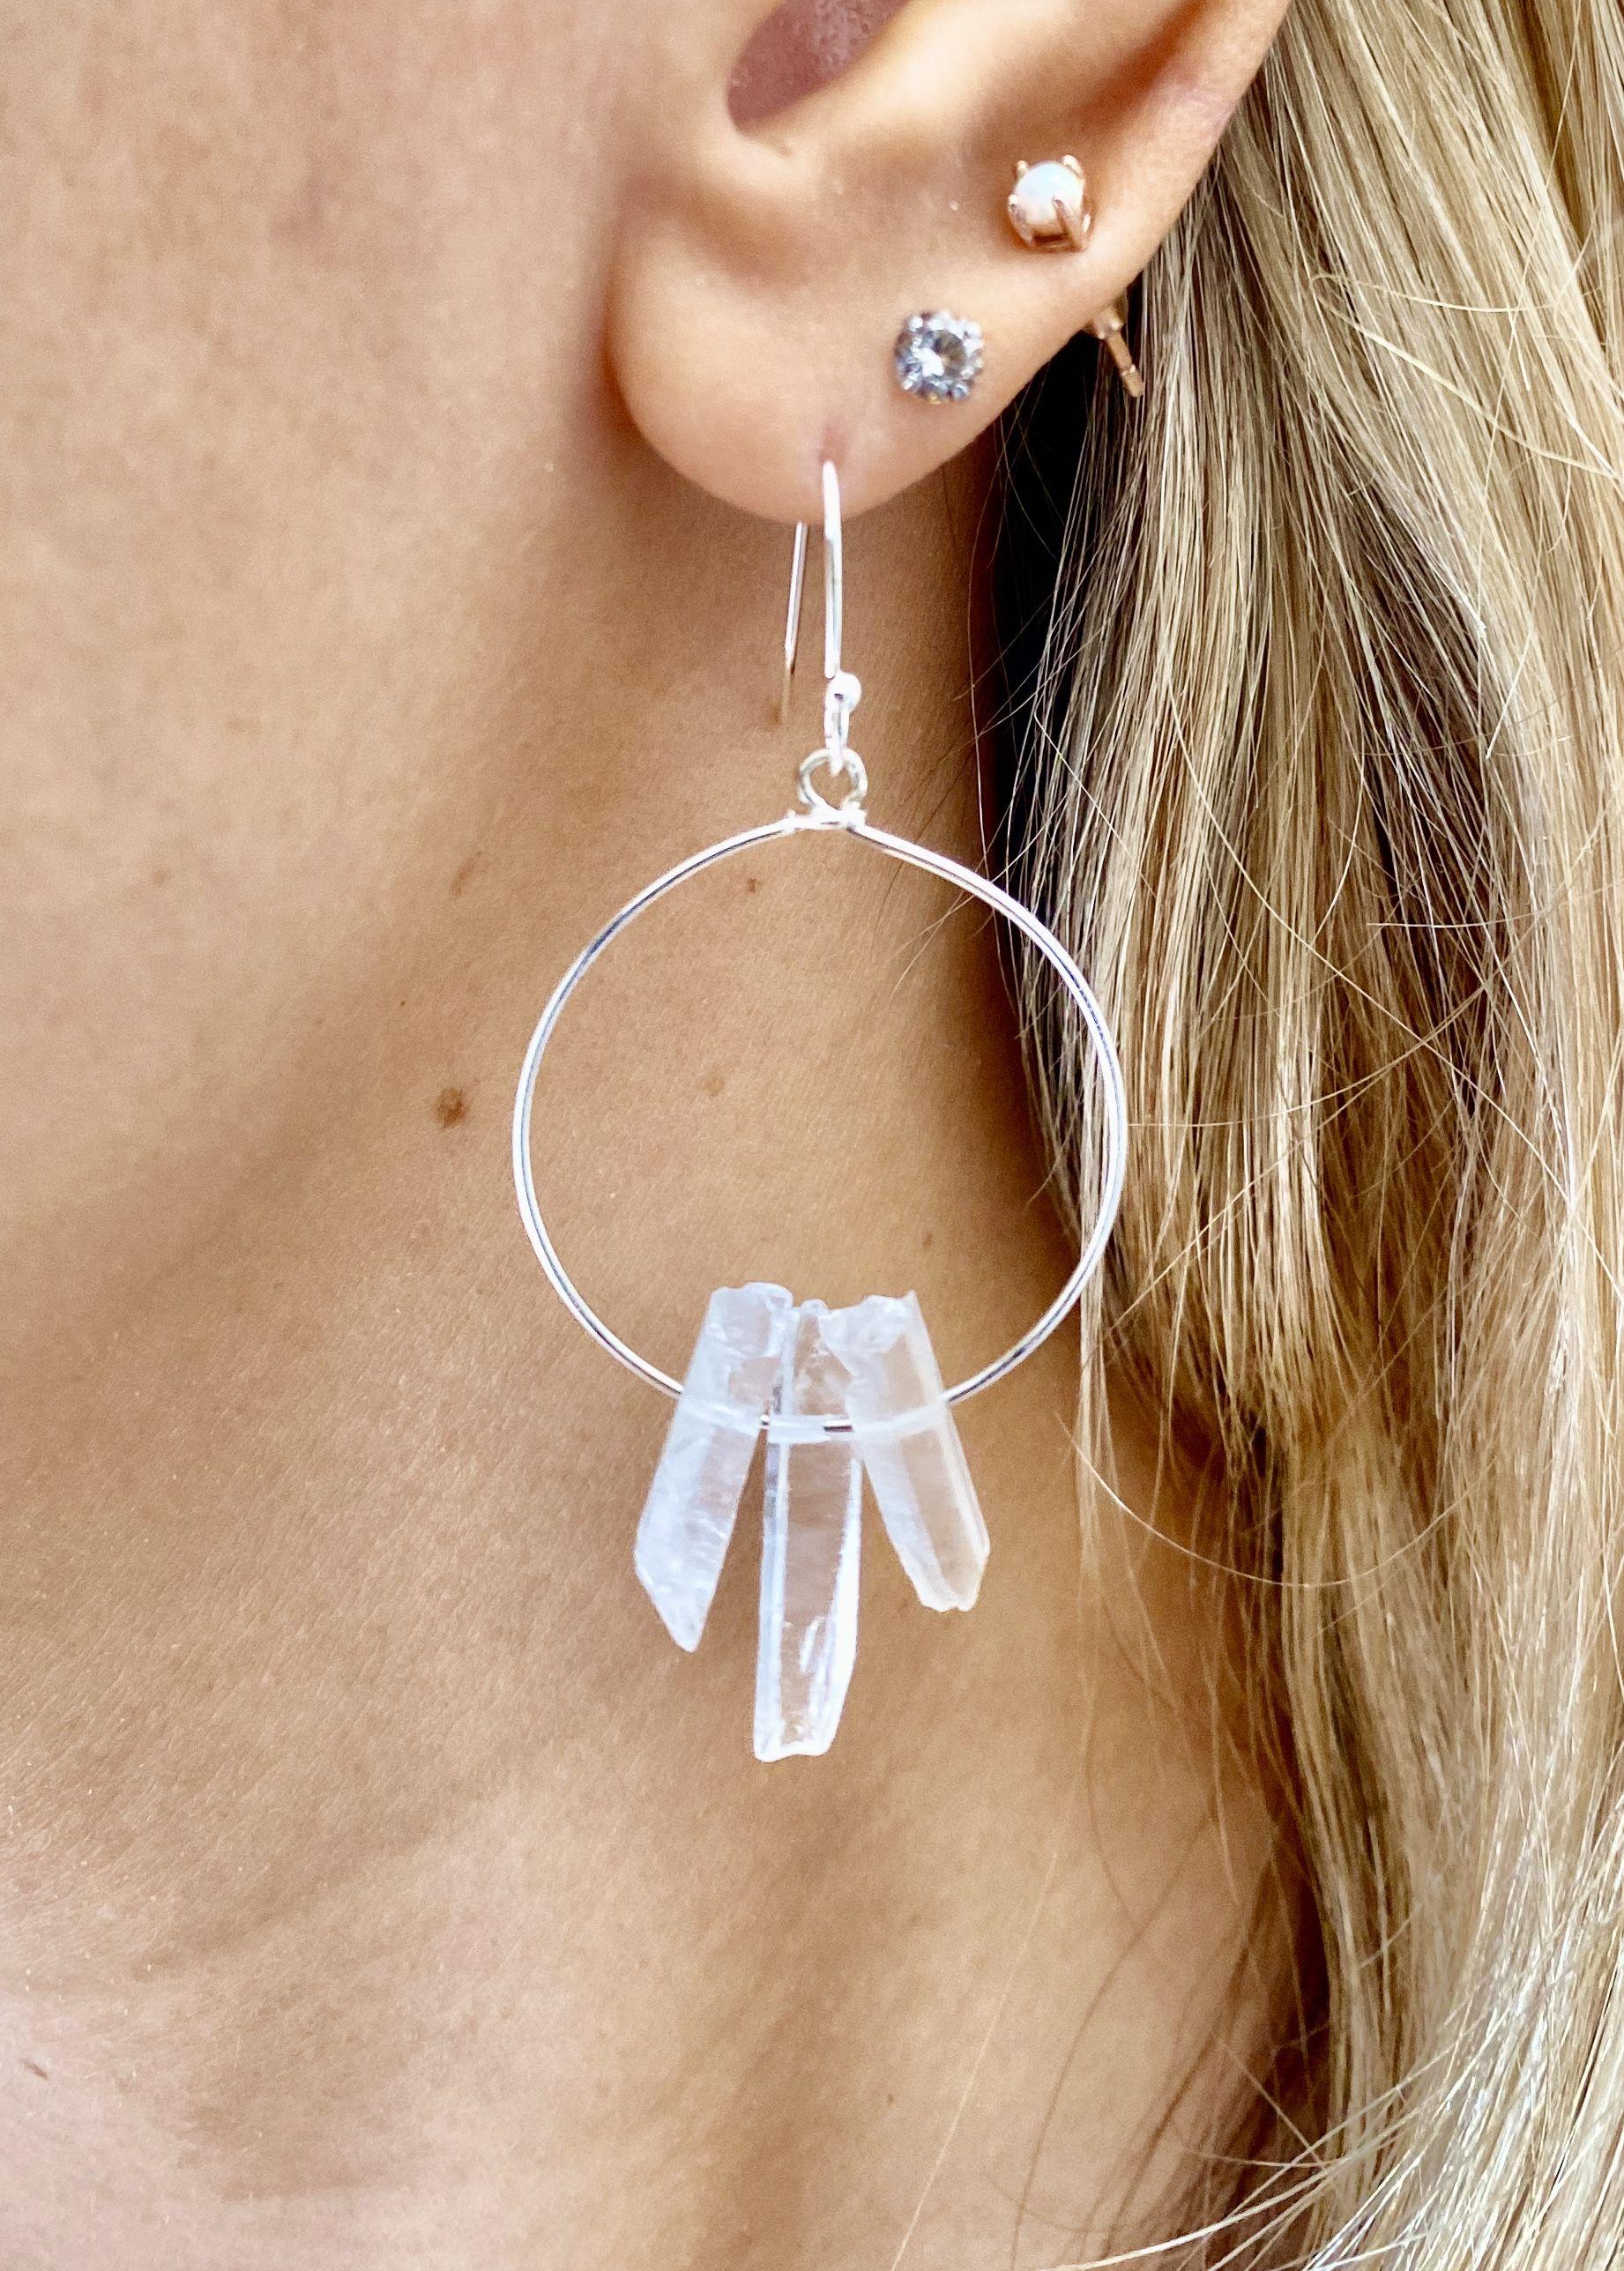 Quartz Hoop Earrings Minimalist Quartz Earrings Gold Minimalist Earrings Dainty Quartz Hoops. Long Gold Earrings Quartz Dangle Earrings